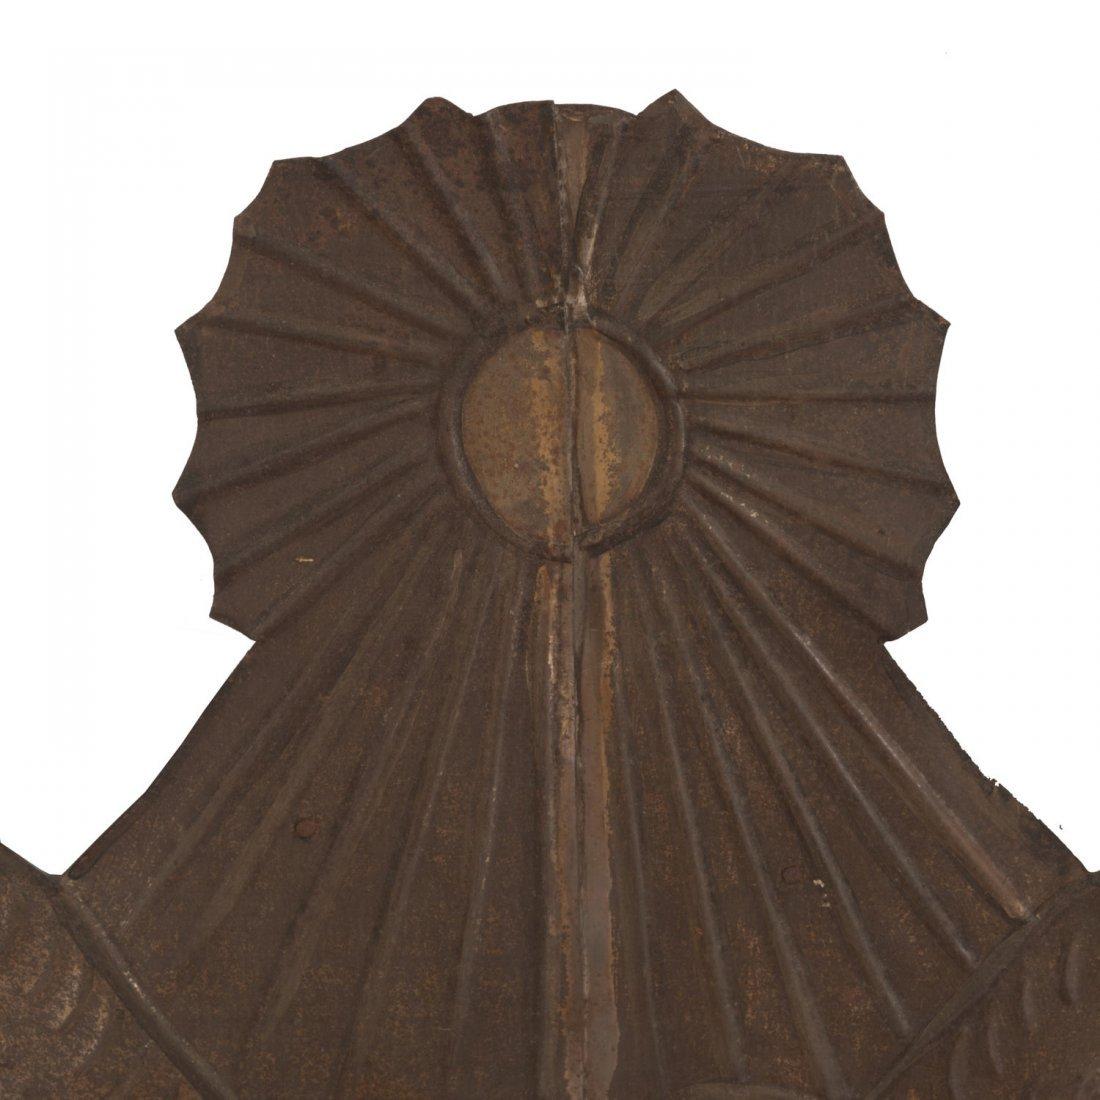 Pr Spanish Colonial style gilt metal wall mirrors - 4